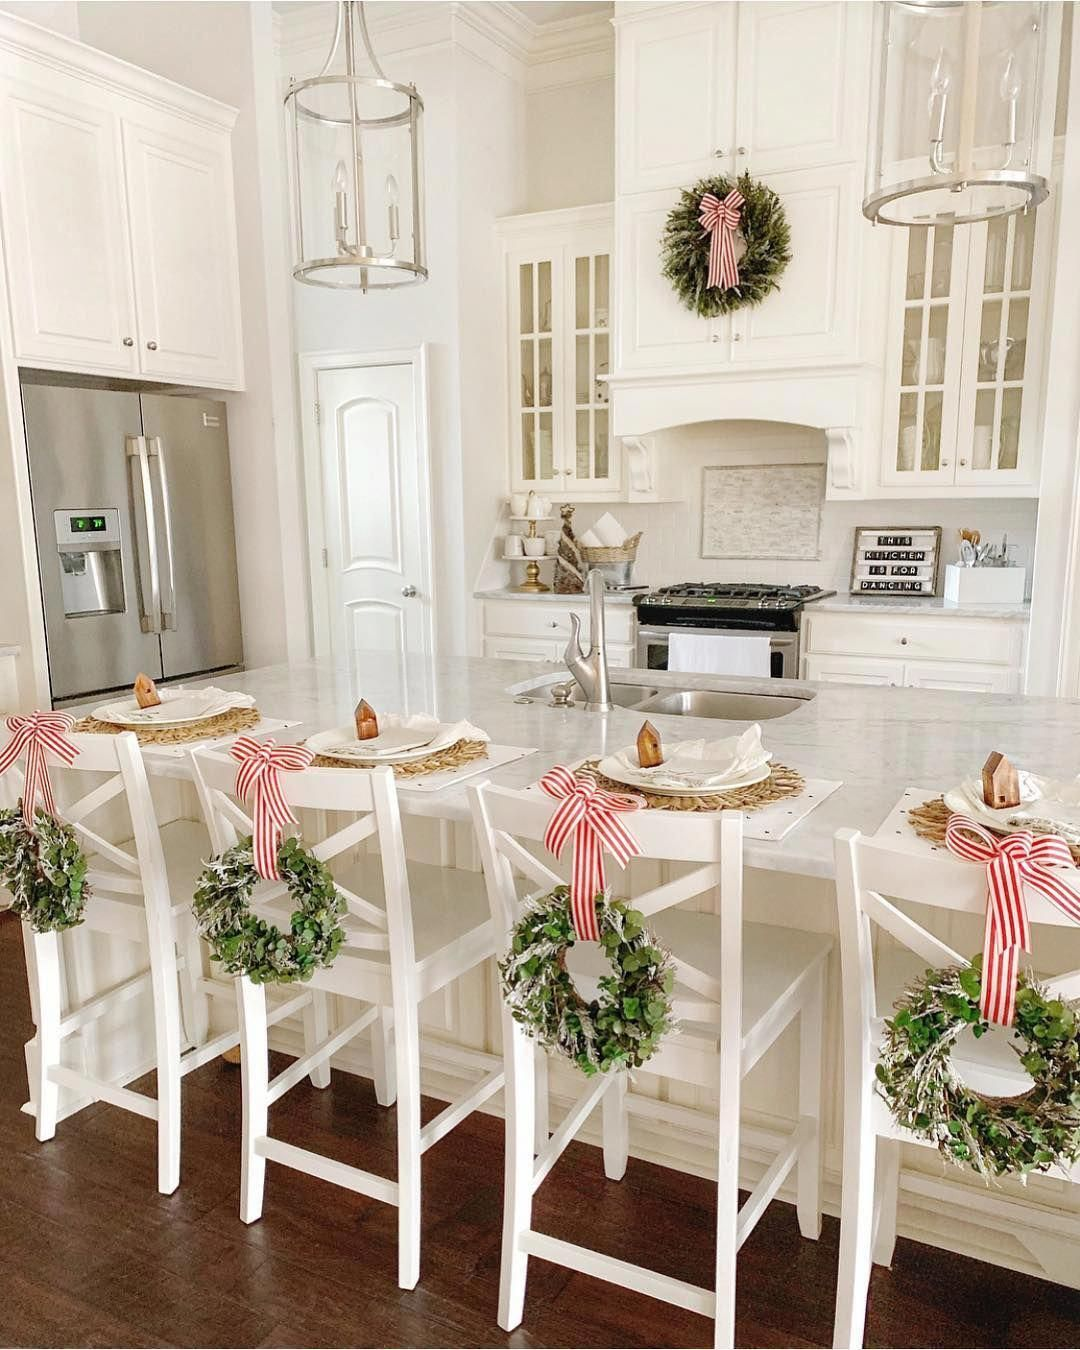 Homemade christmas gifts for nursing home residents